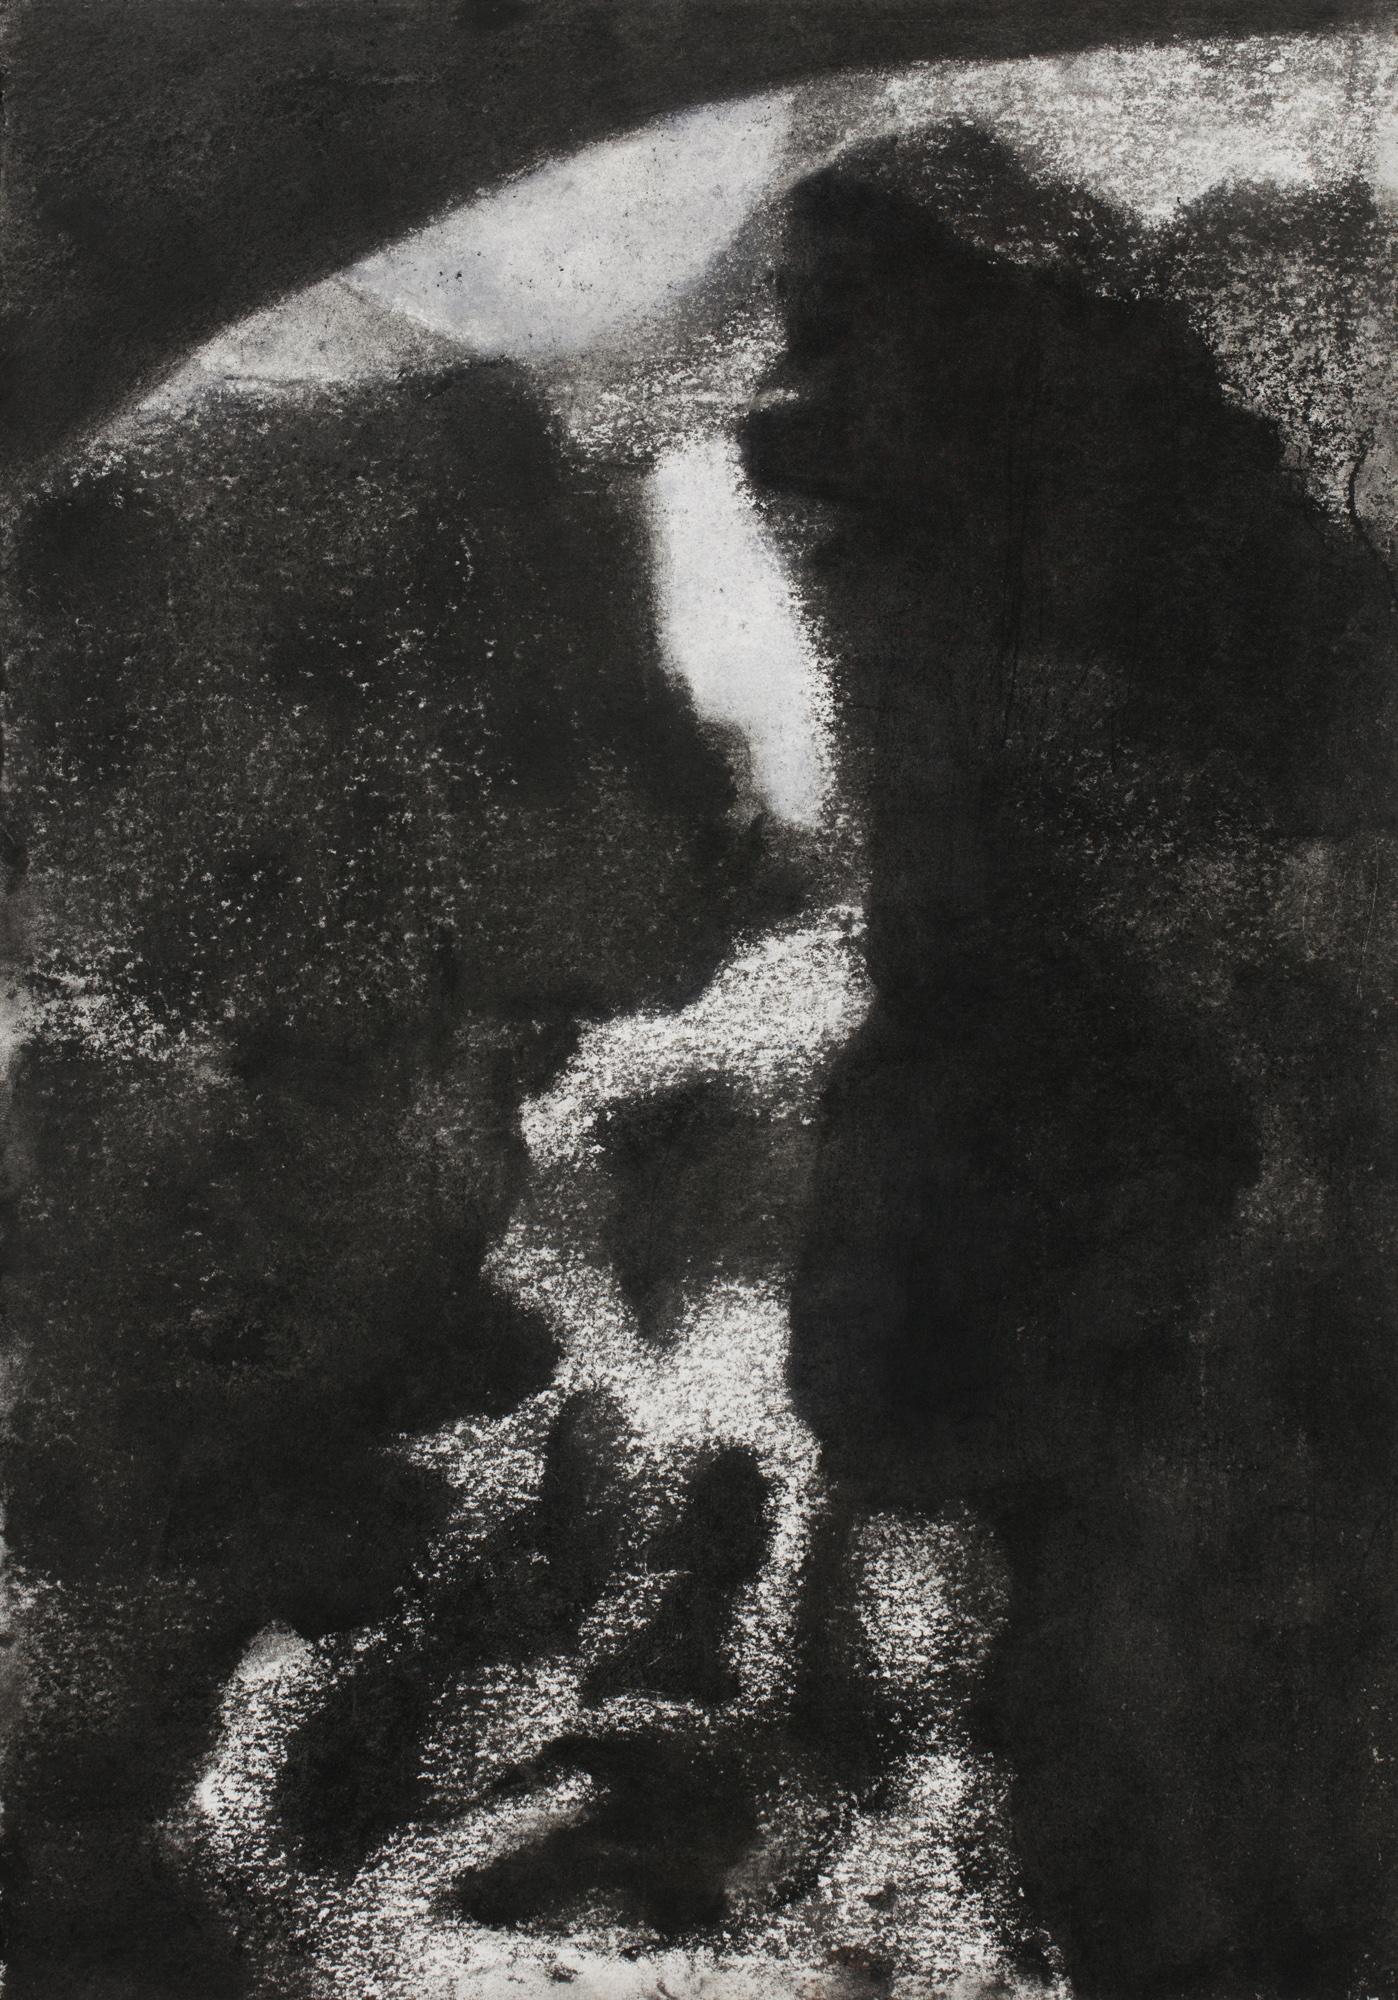 CFHill_14aug-192460.jpg